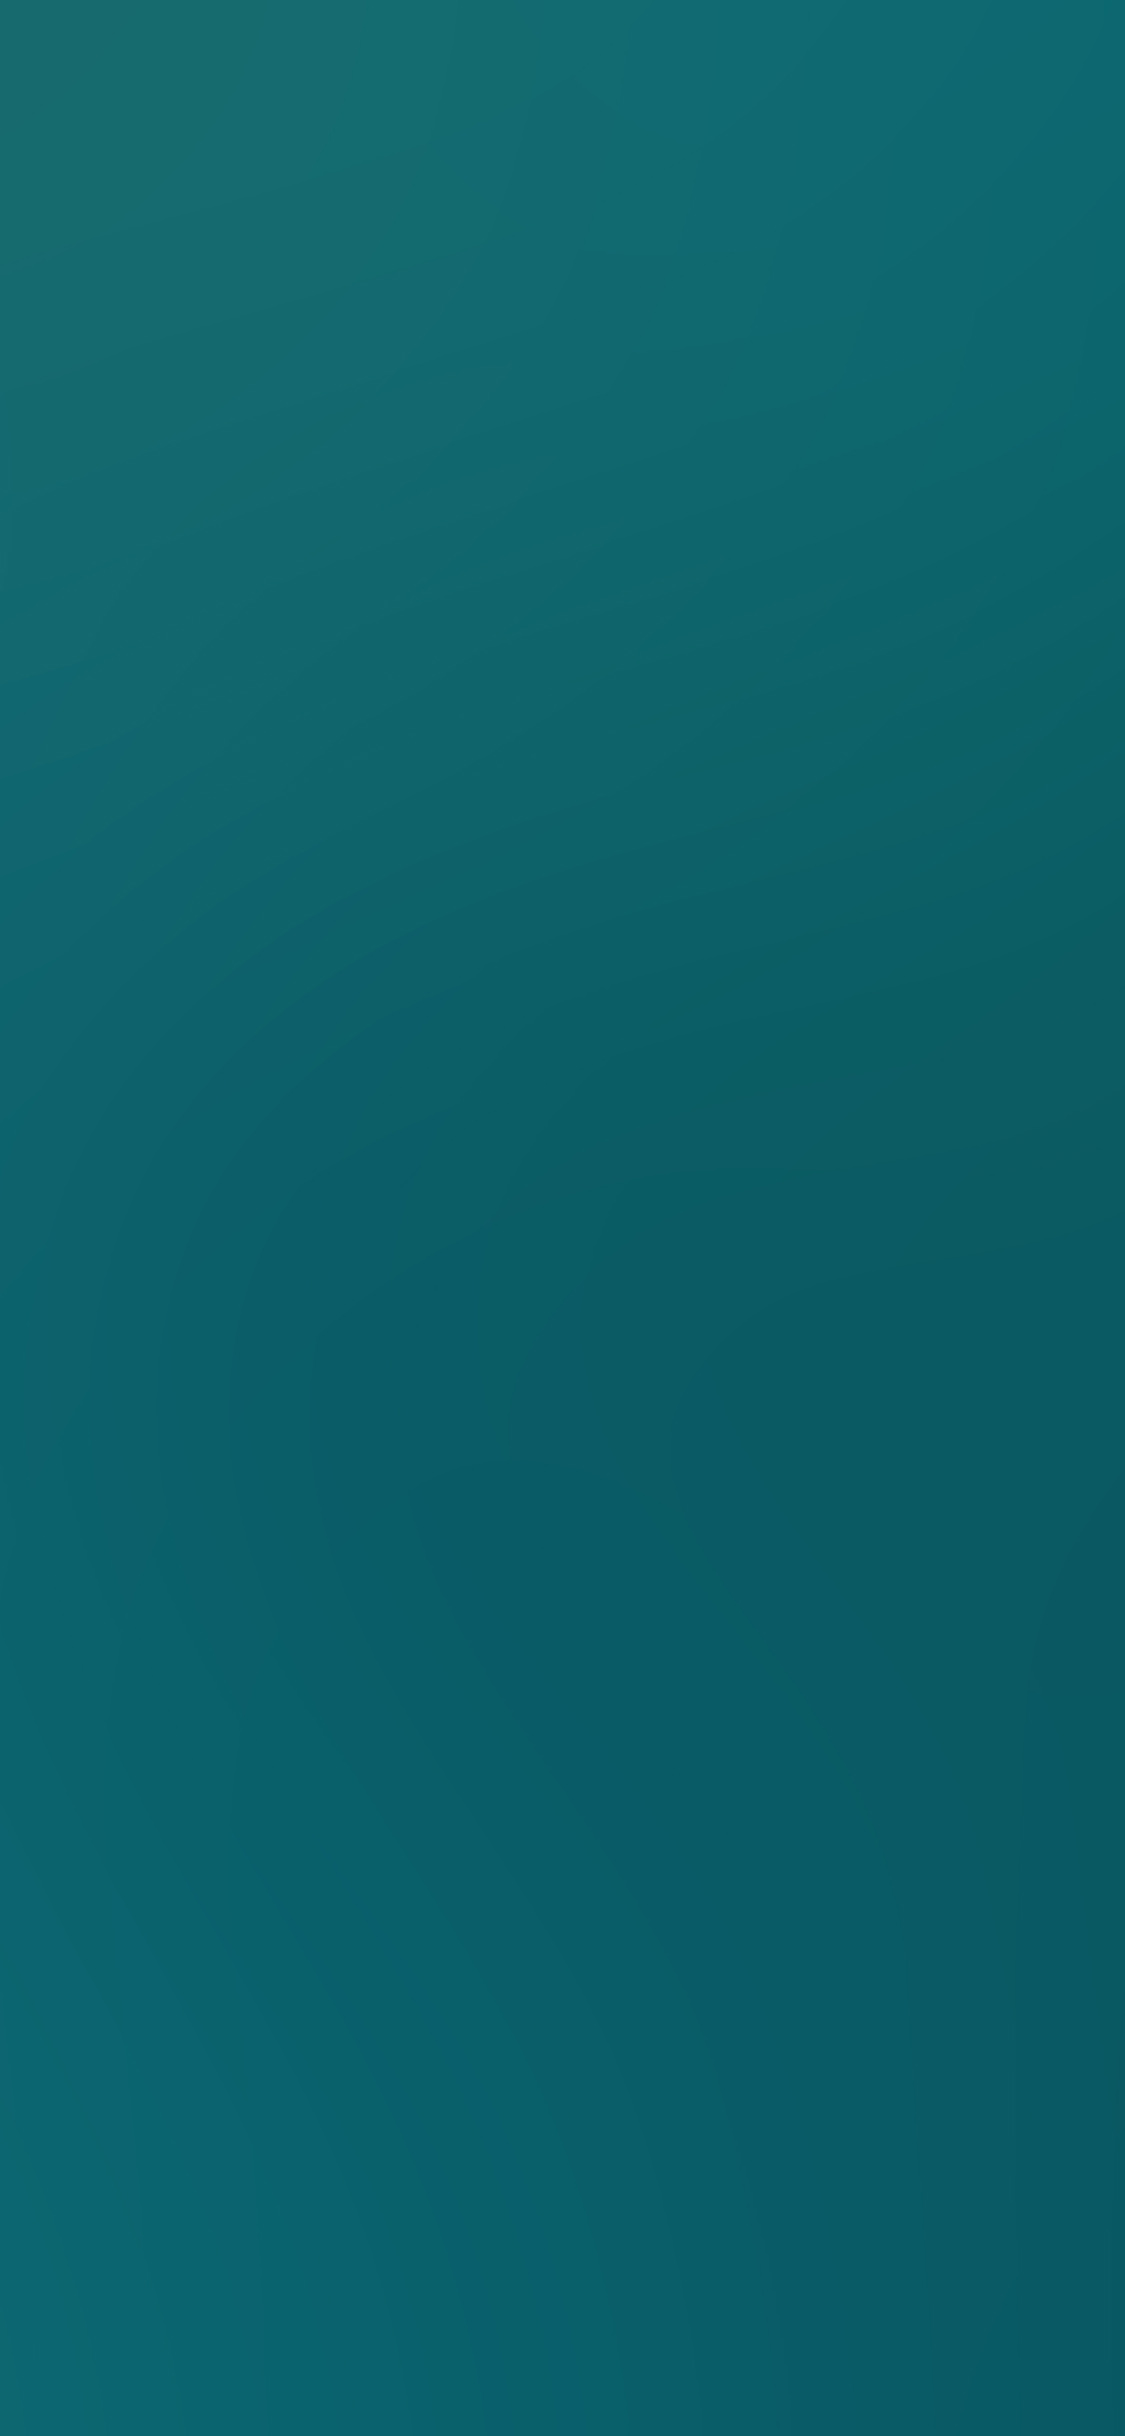 iPhoneXpapers.com-Apple-iPhone-wallpaper-sf14-blue-green-fog-gradation-blur